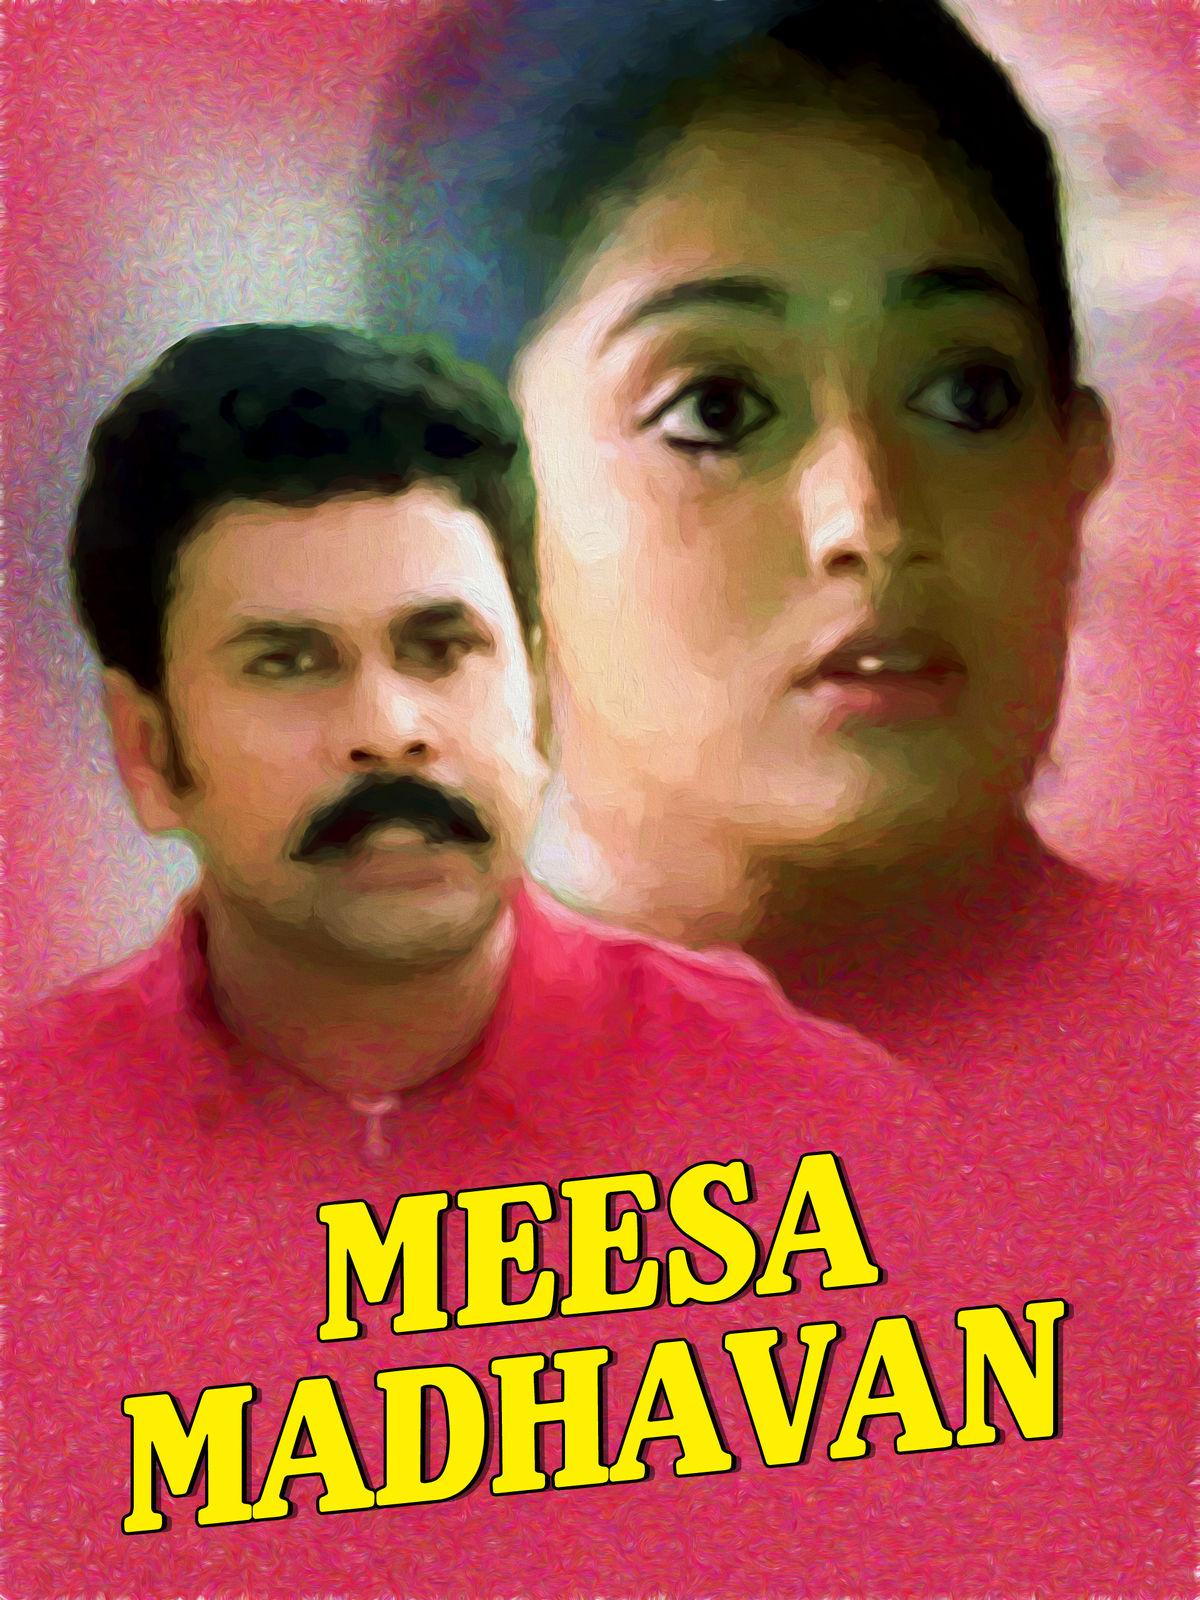 Jayesh Pazhanimala Best Movies, TV Shows and Web Series List